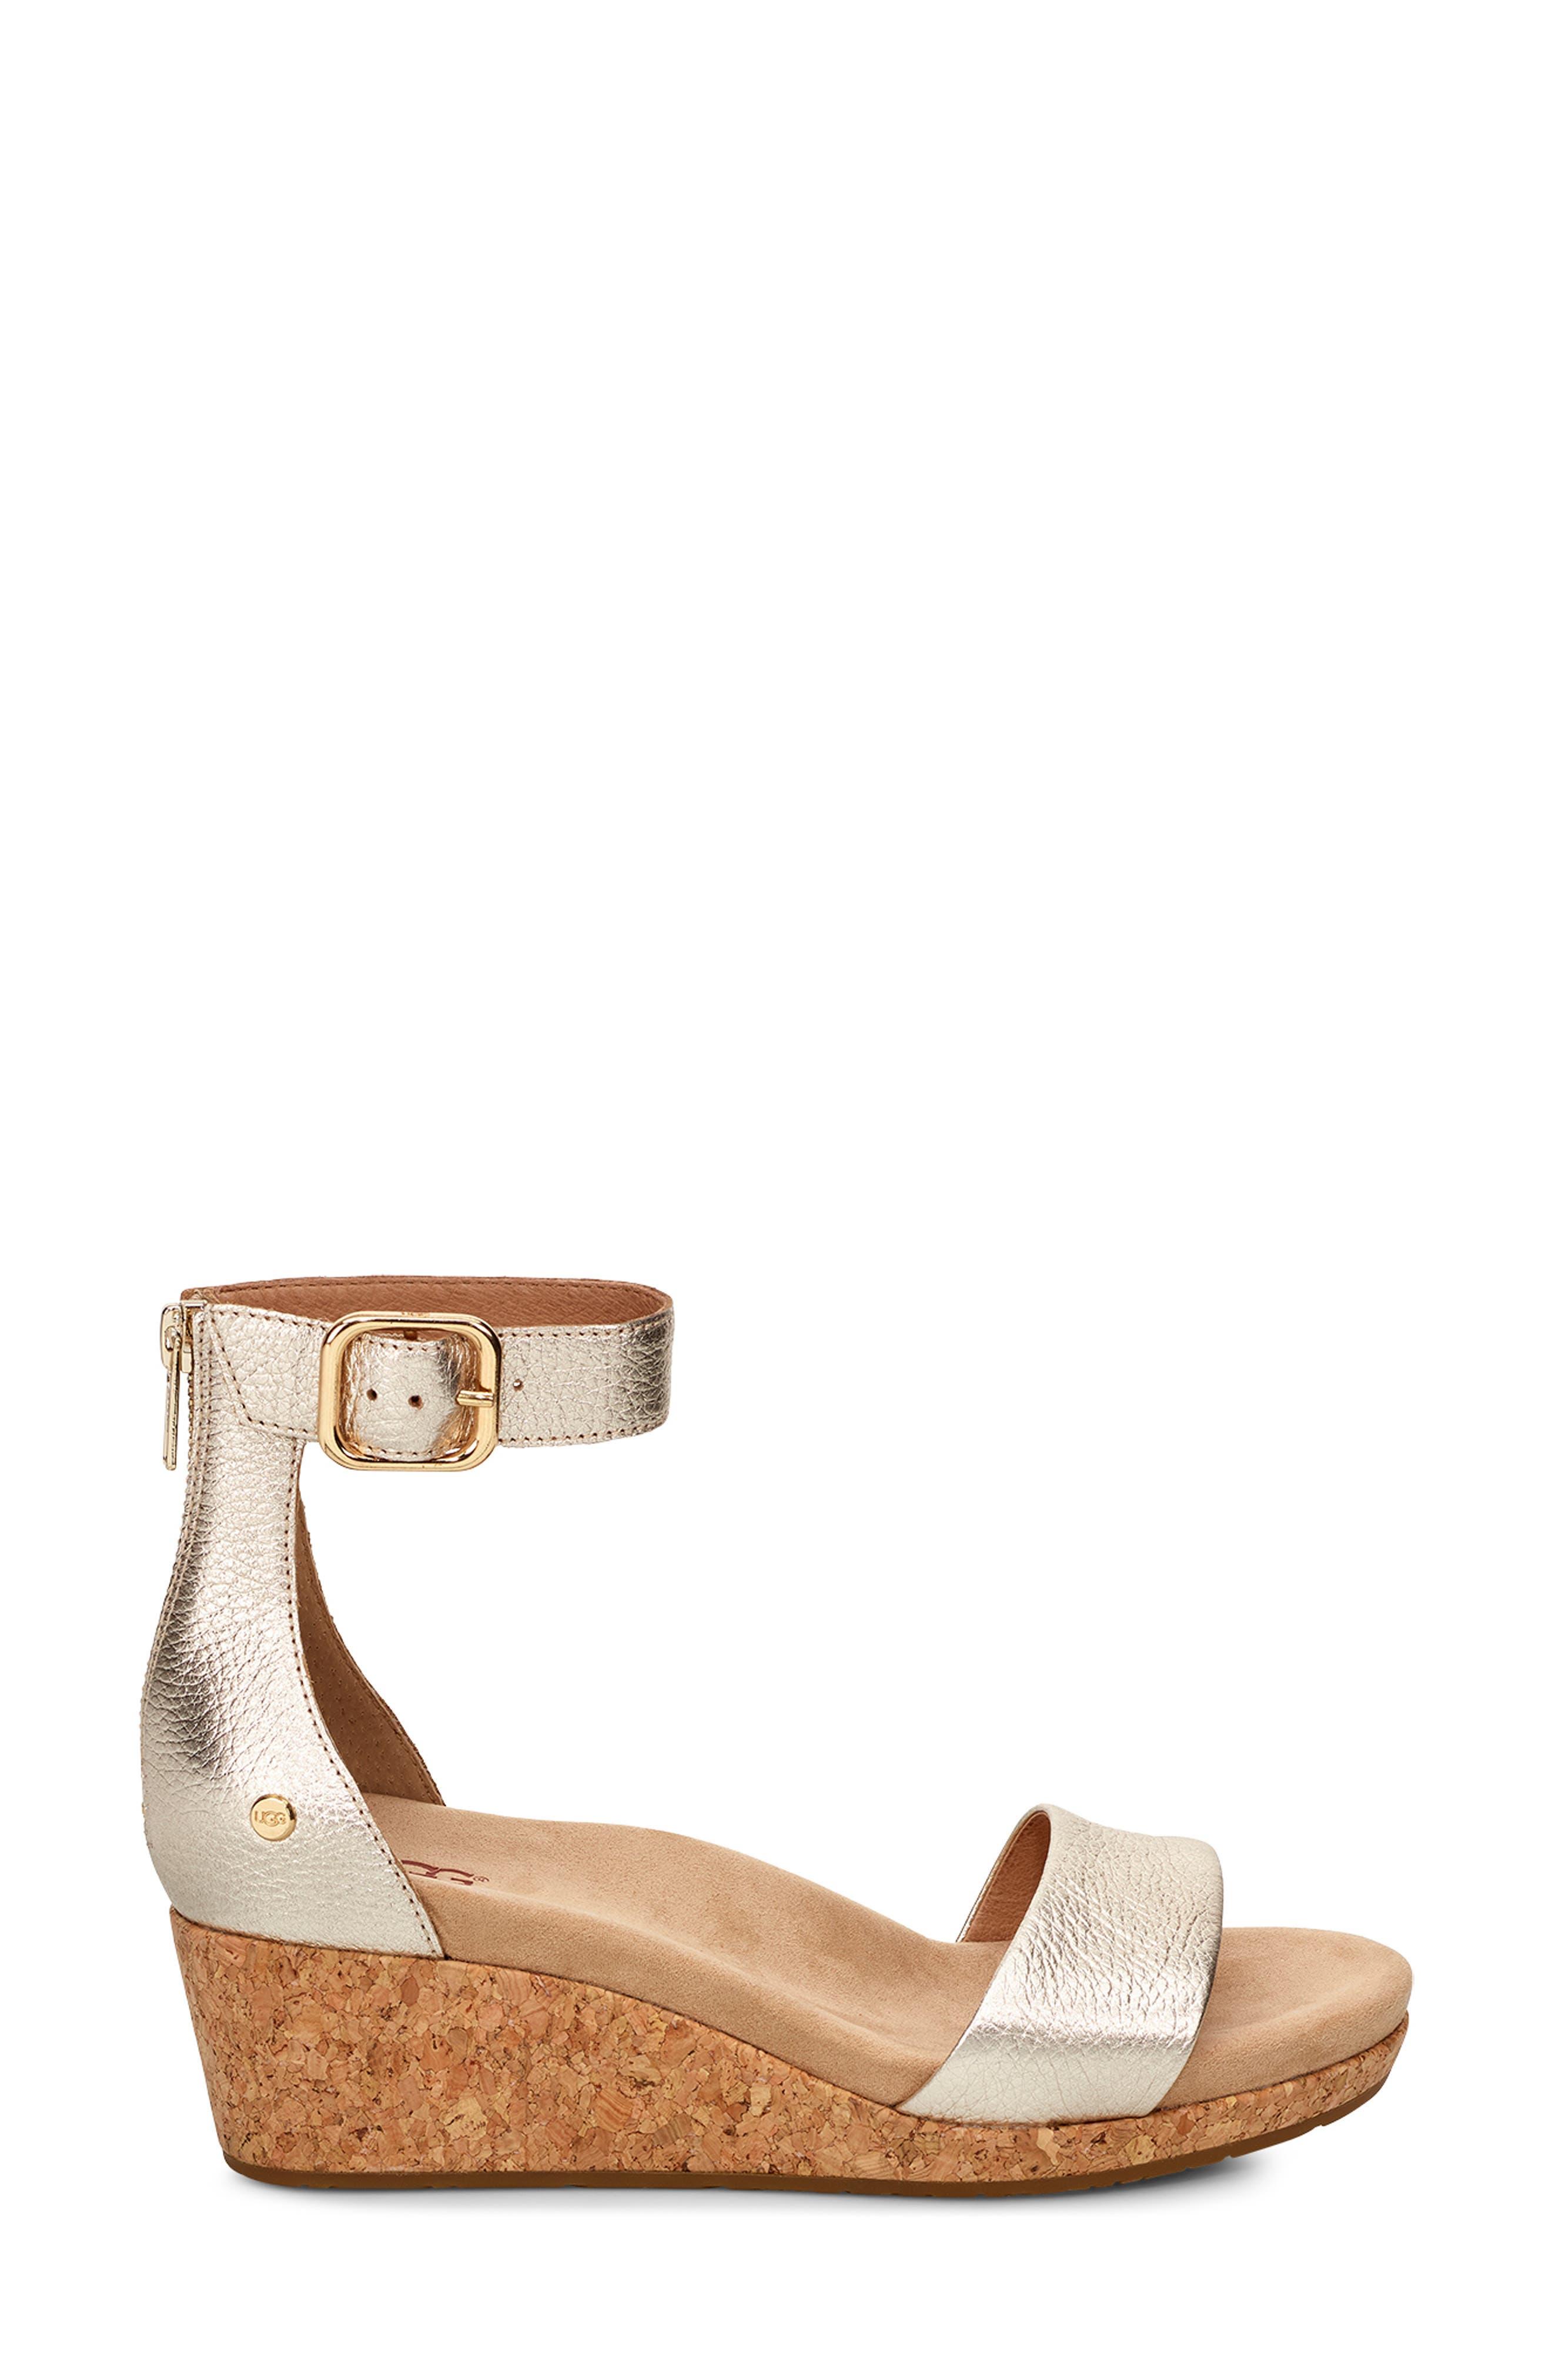 UGG<SUP>®</SUP>, Zoe II Metallic Wedge Sandal, Alternate thumbnail 3, color, GOLD LEATHER